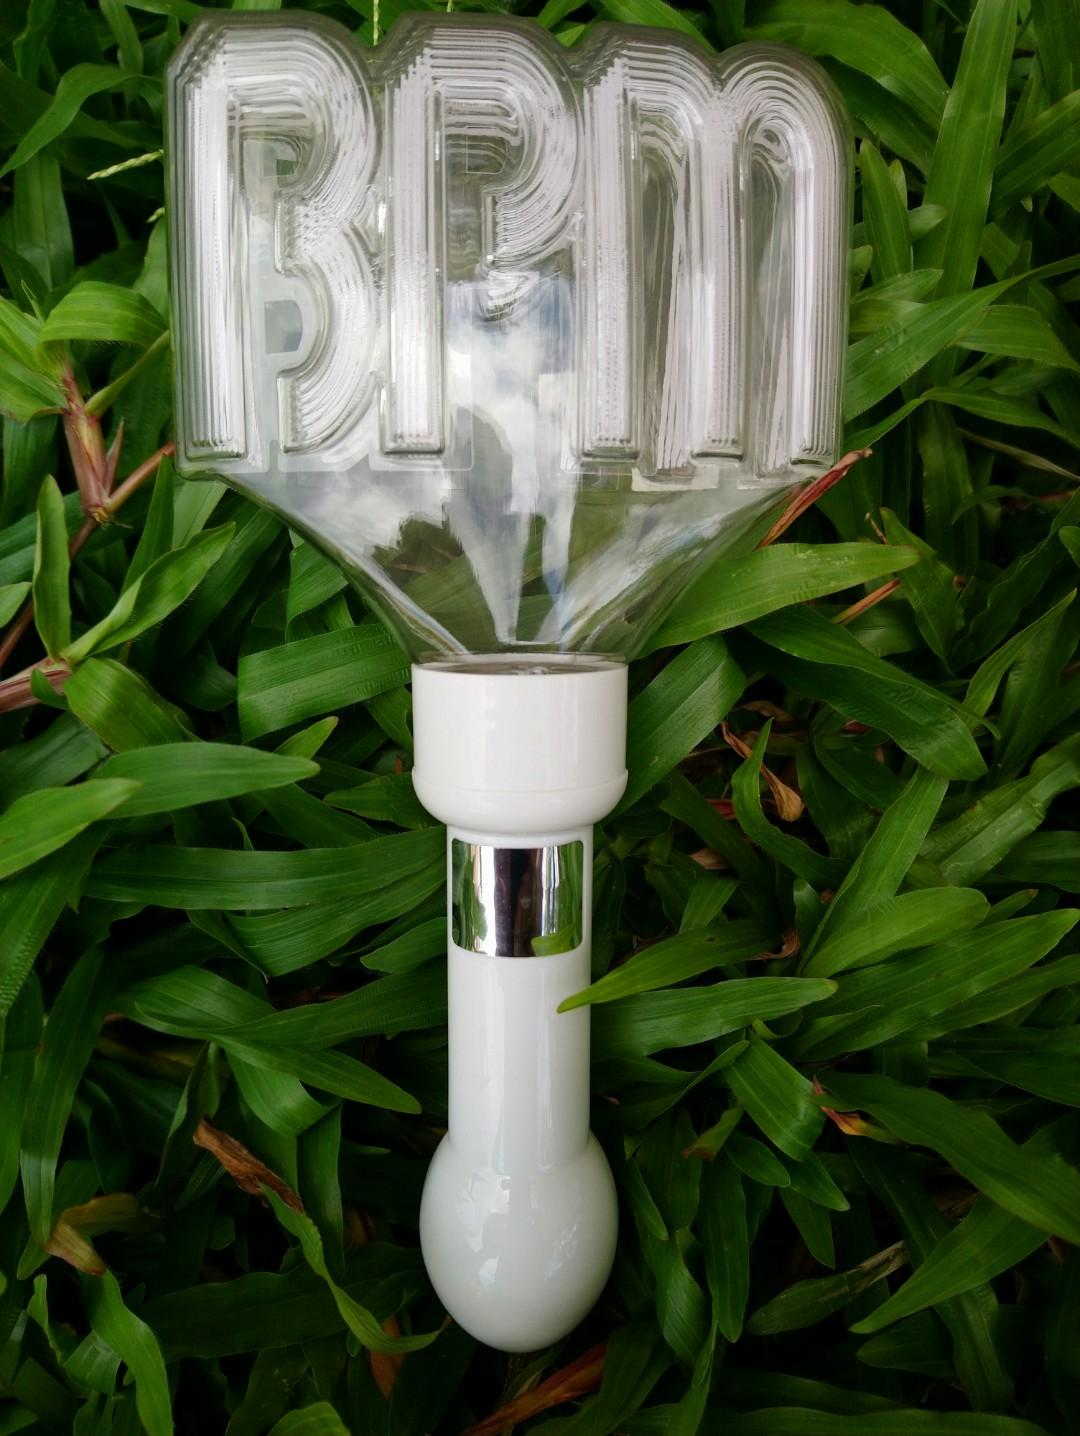 KinKi kids/堂本光一-KOICHI DOMOTO Concert Tour 2010 BPM-Stick Light(Official Collectibles)-**with free souvenir